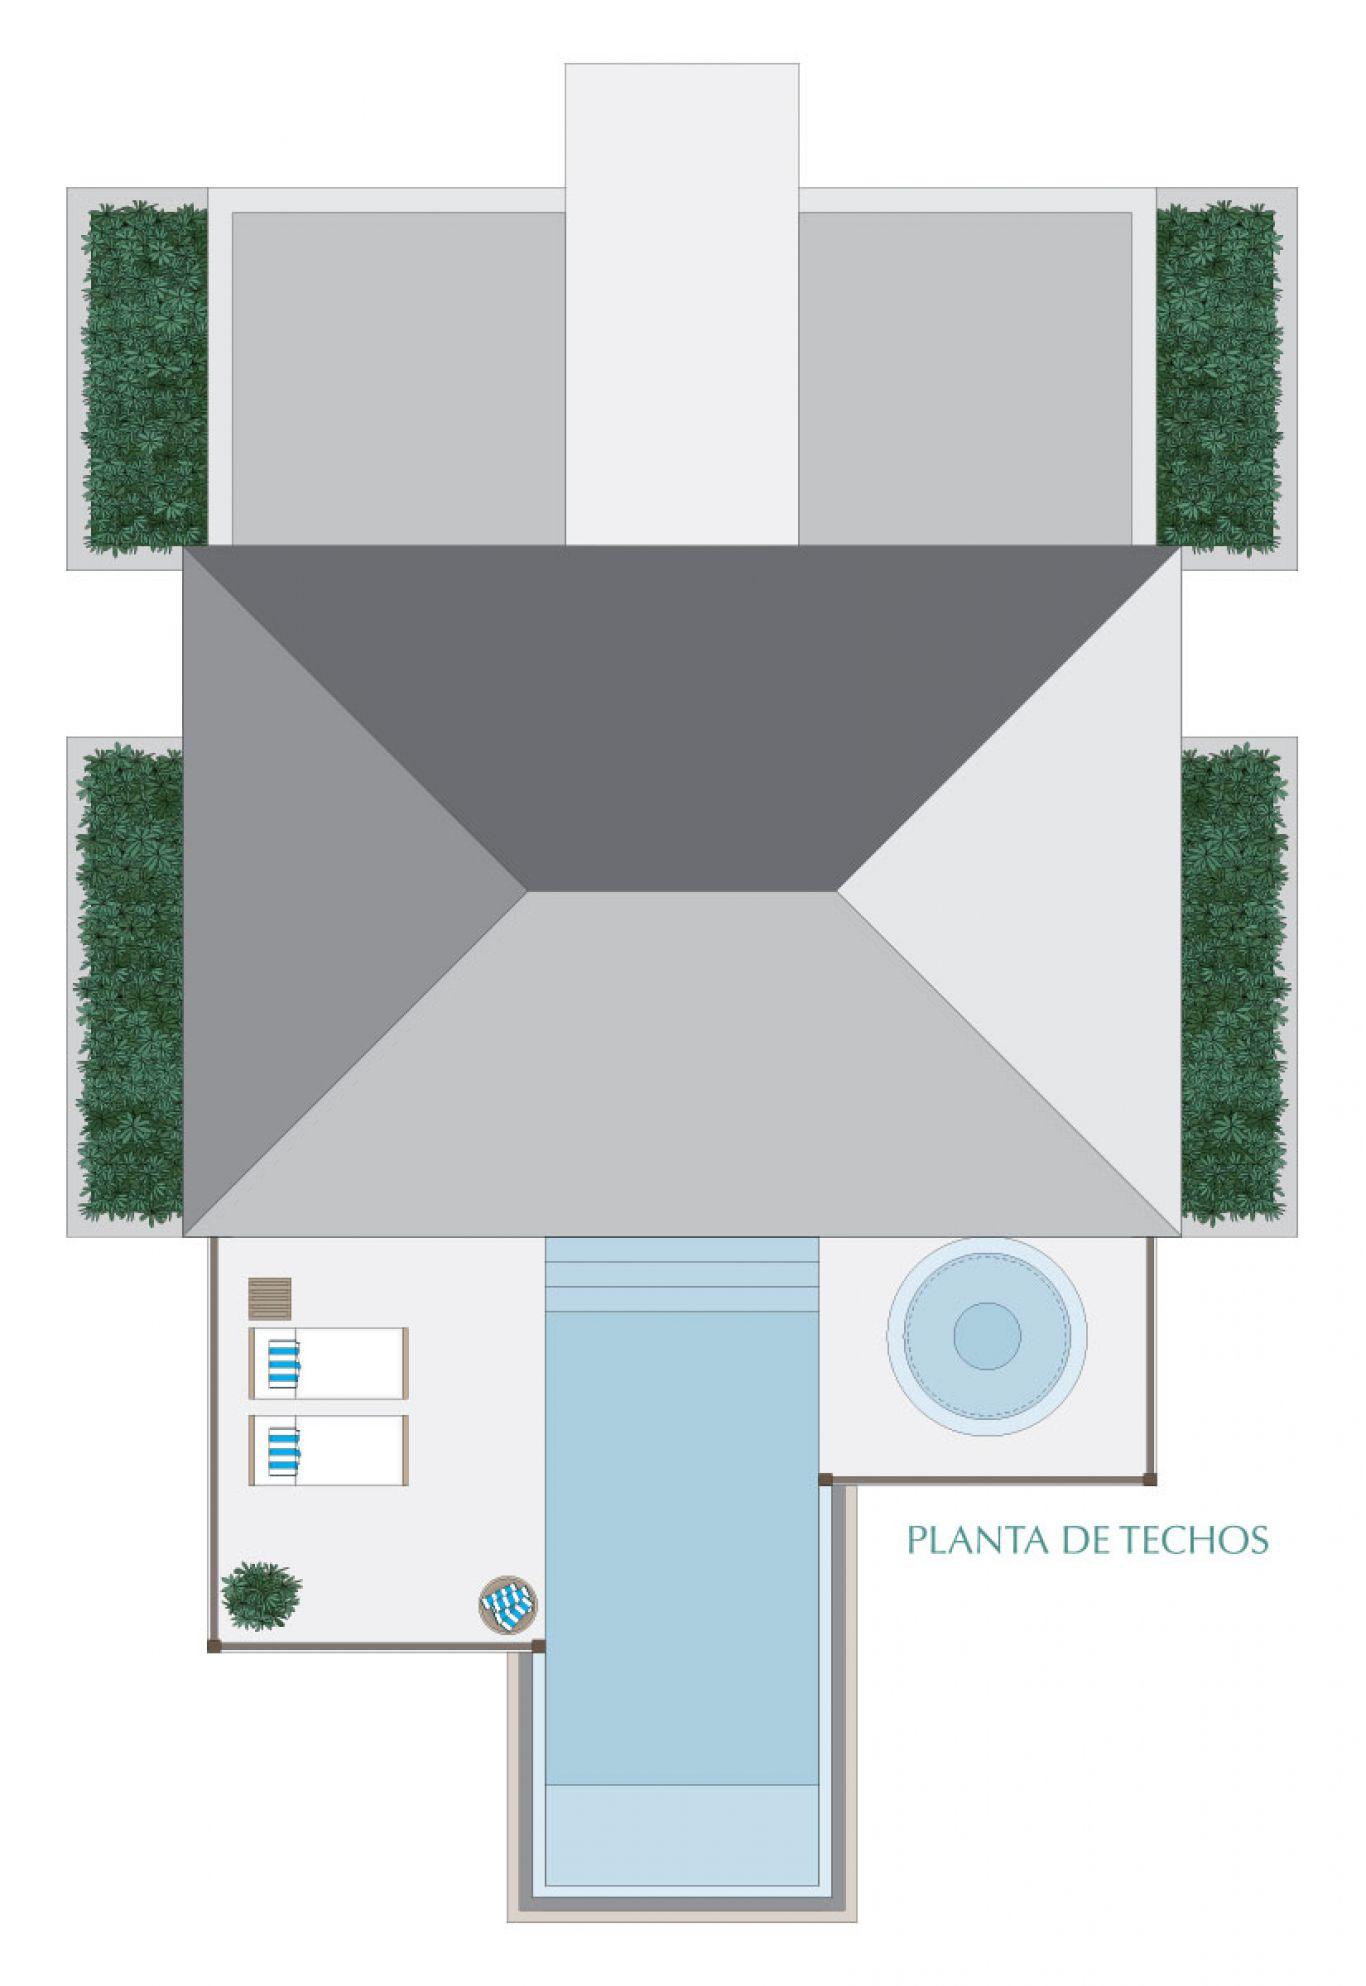 Manai, id 1519068, no 3, plano de villa 5, 294